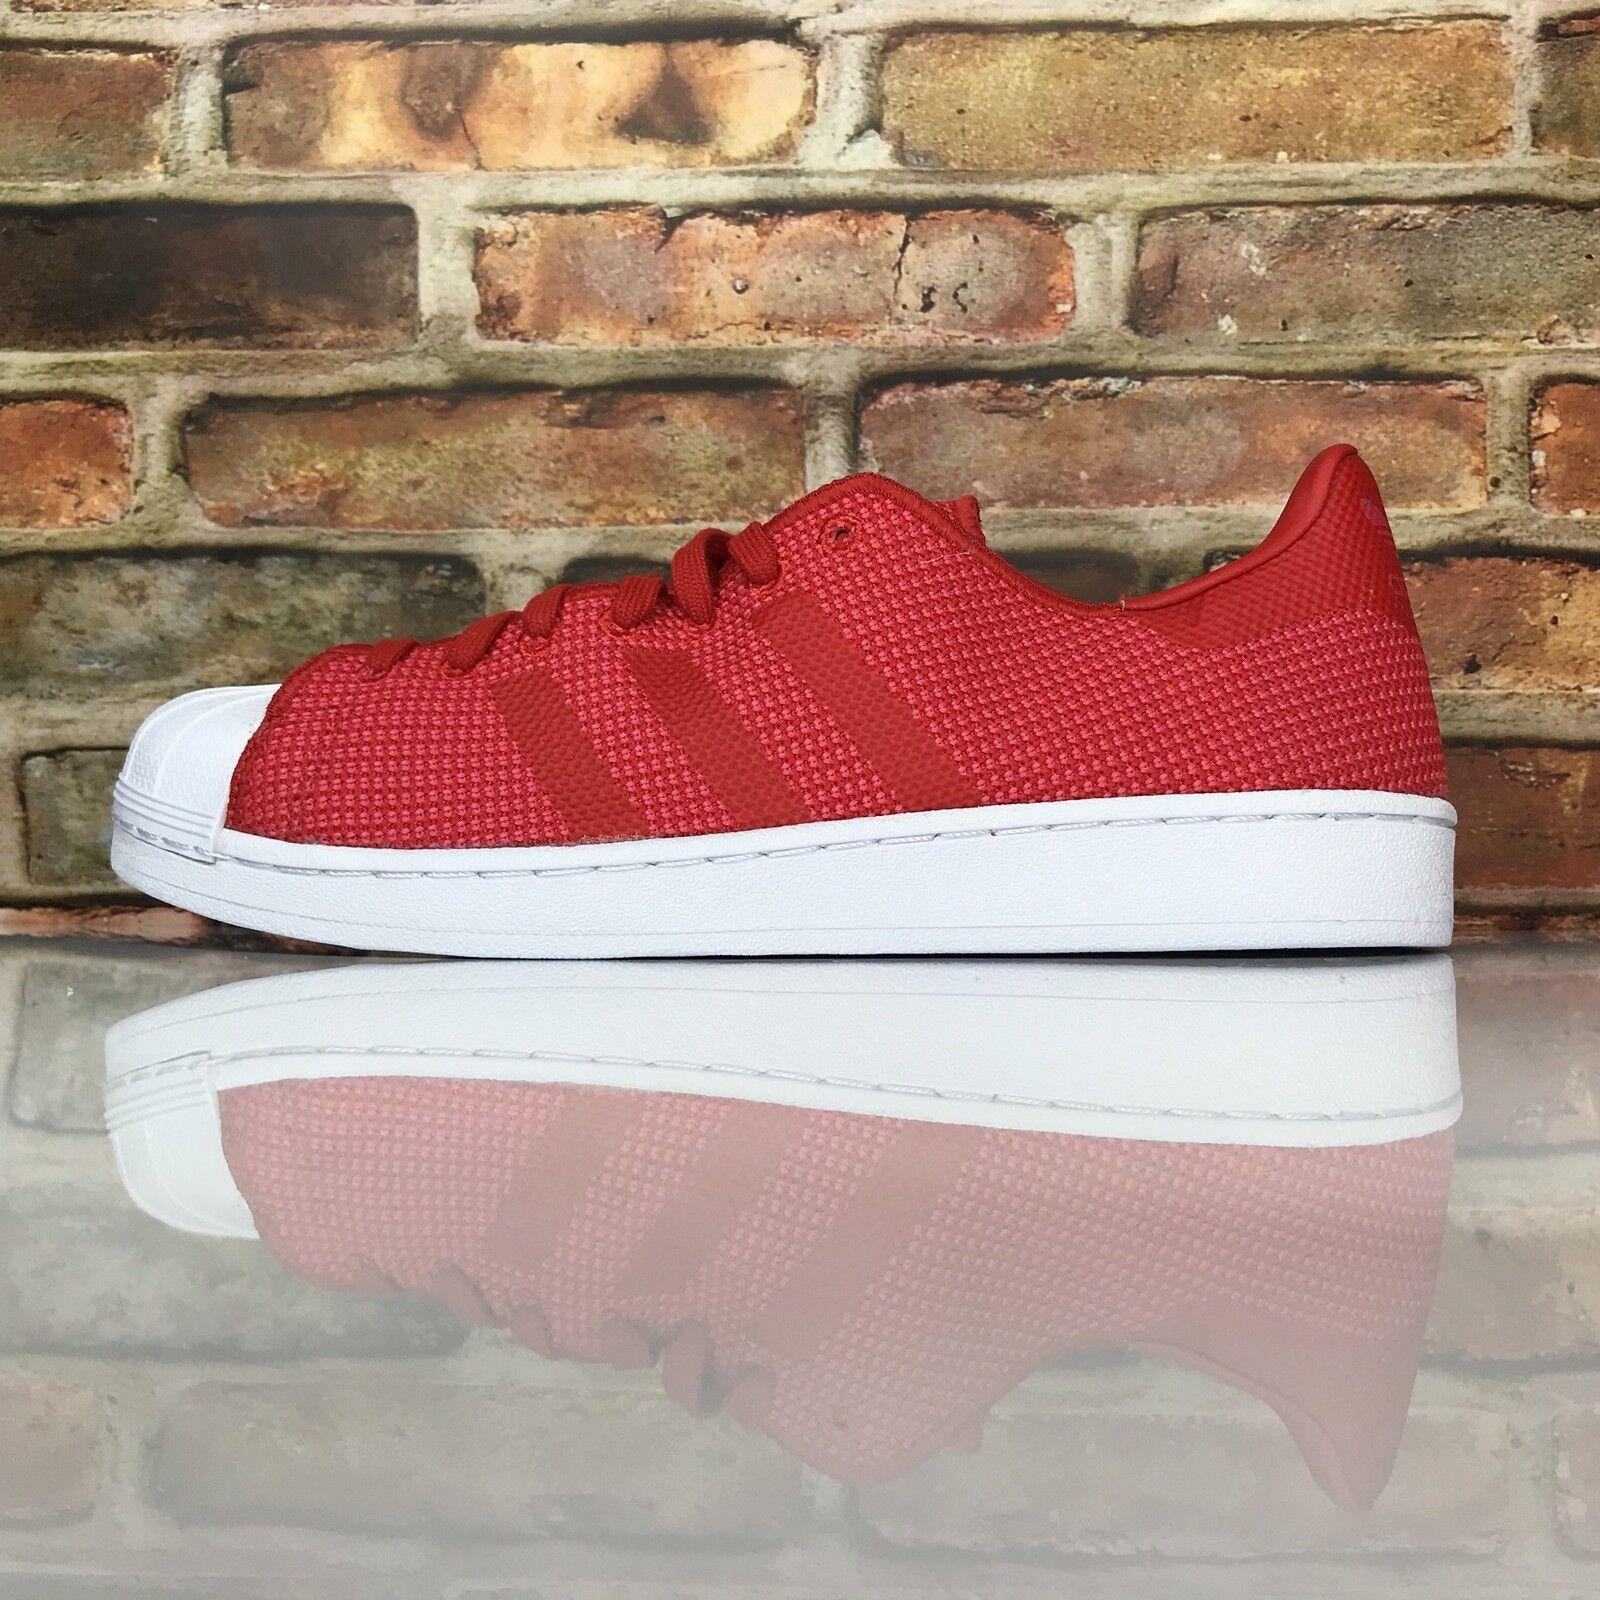 Adidas Superstar Originals da Uomo 10 Scarpe BiColoreeee Rosso Mesh BY8711 | nuovo venuto  | Uomo/Donna Scarpa